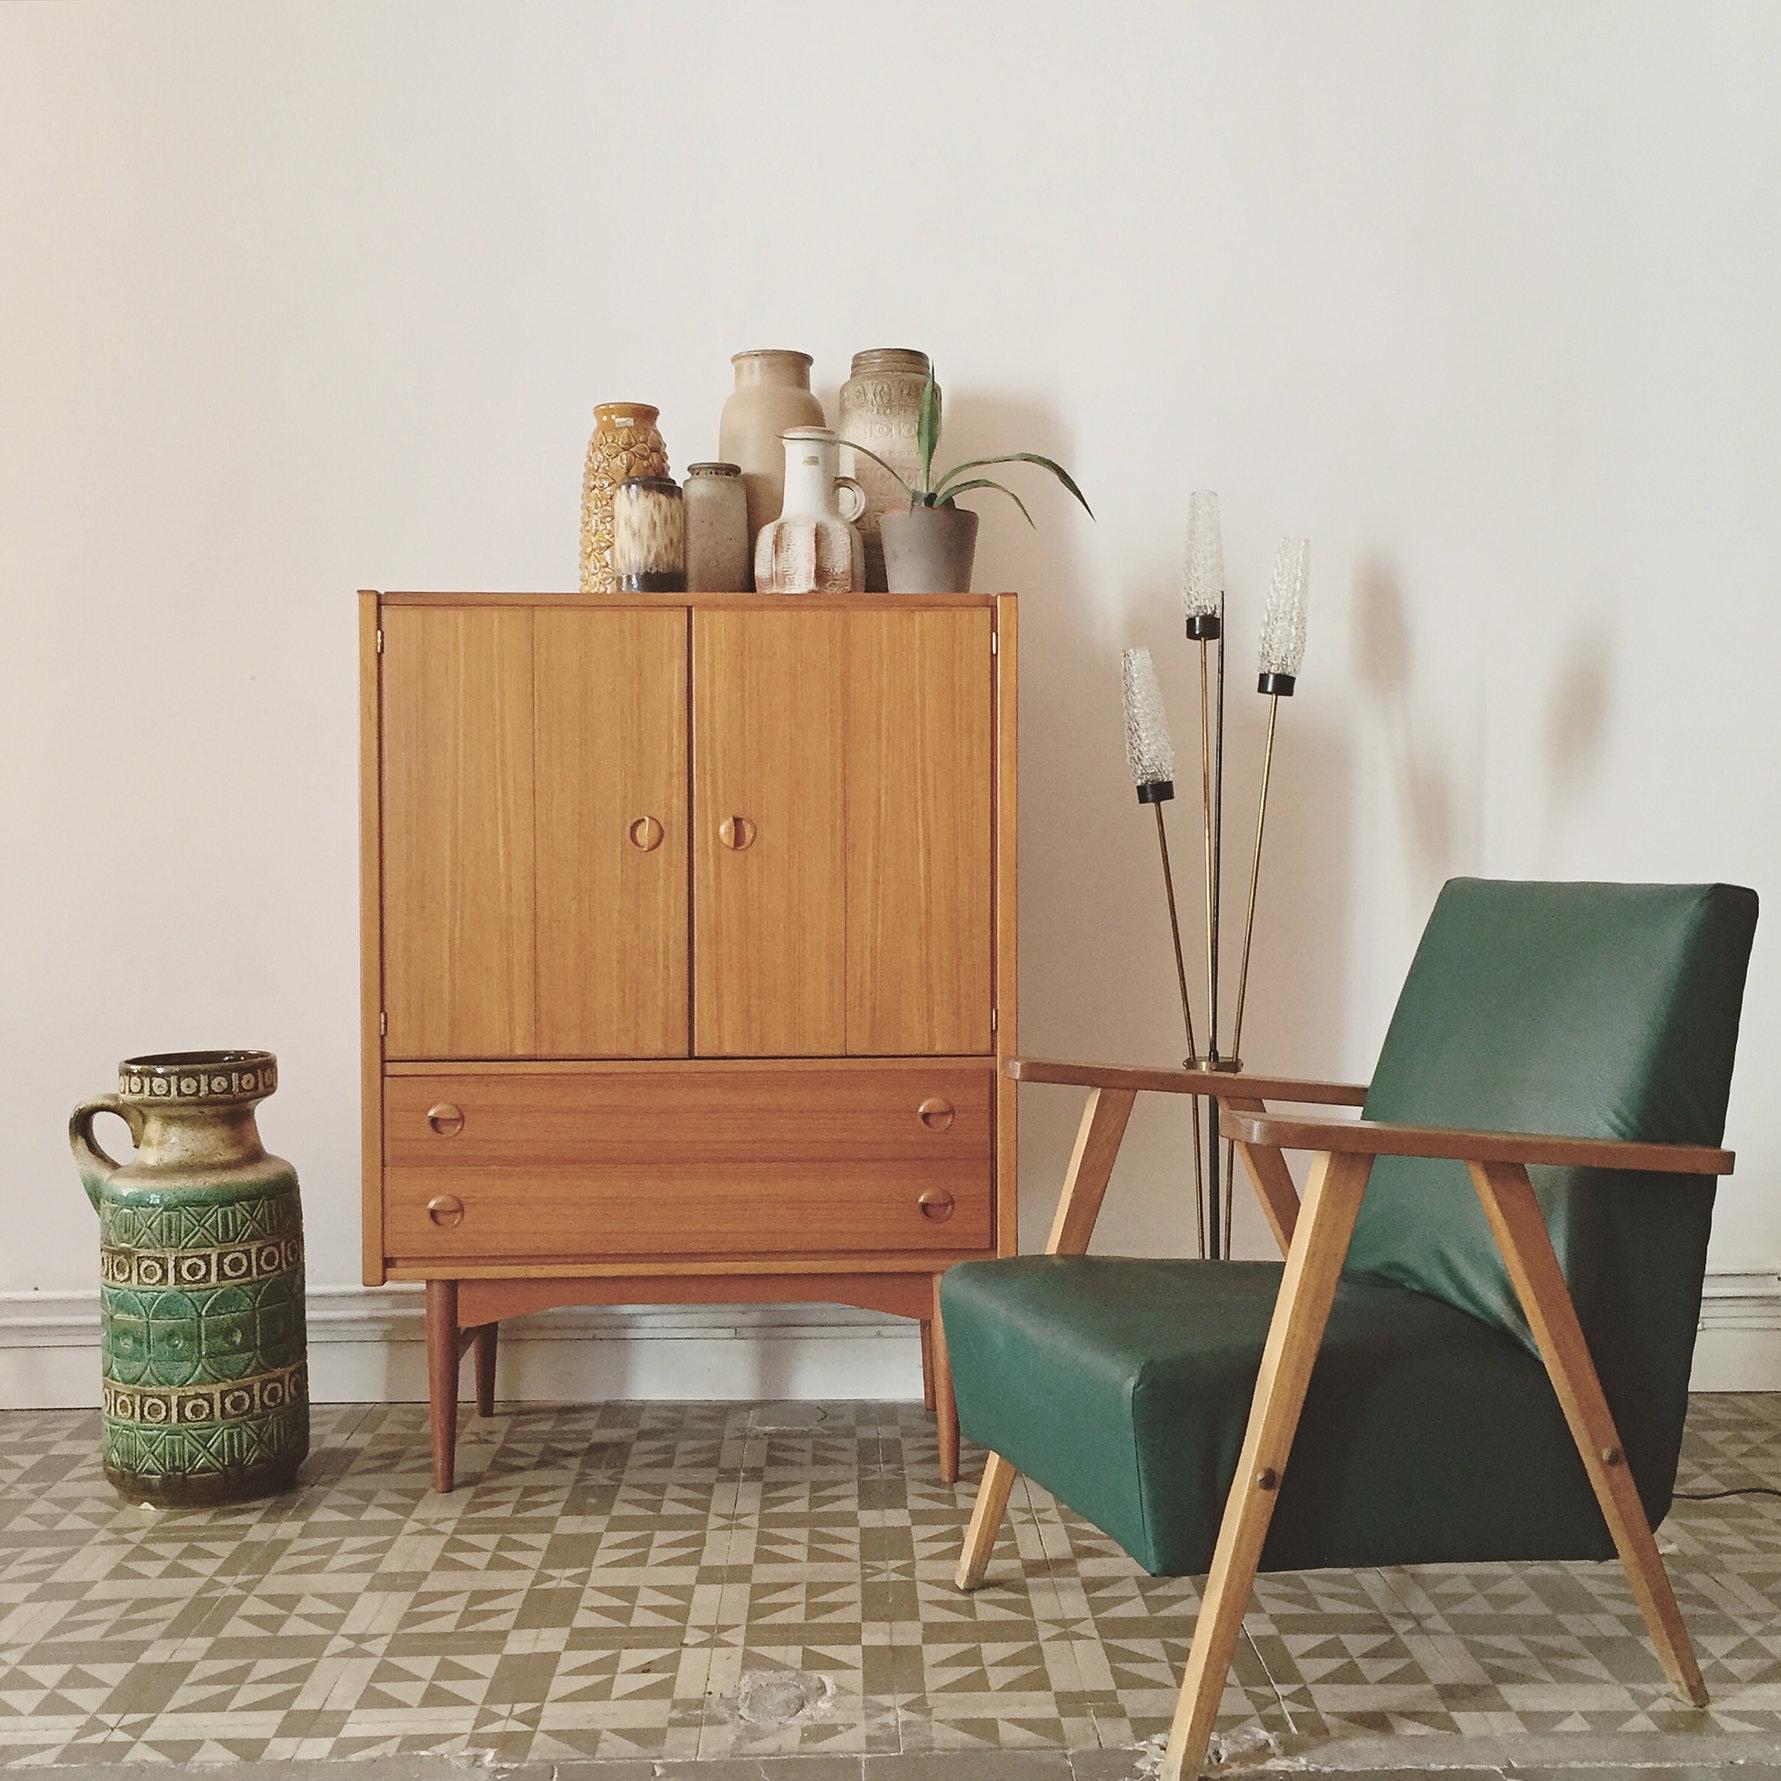 cheznousbcn muebles y objetos vintage en barcelona On muebles escandinavos barcelona